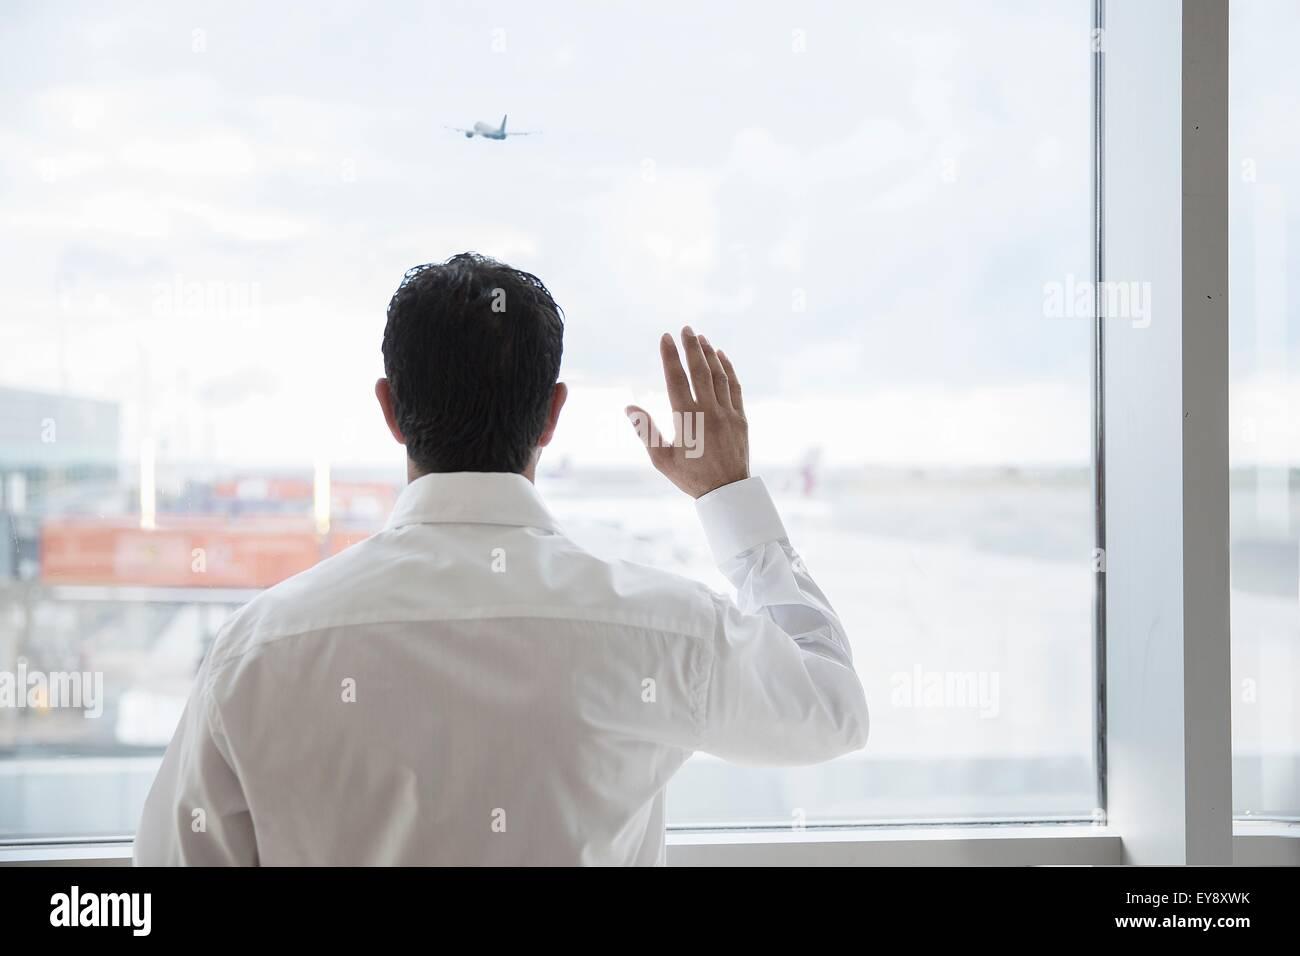 Man at airport window, waving - Stock Image